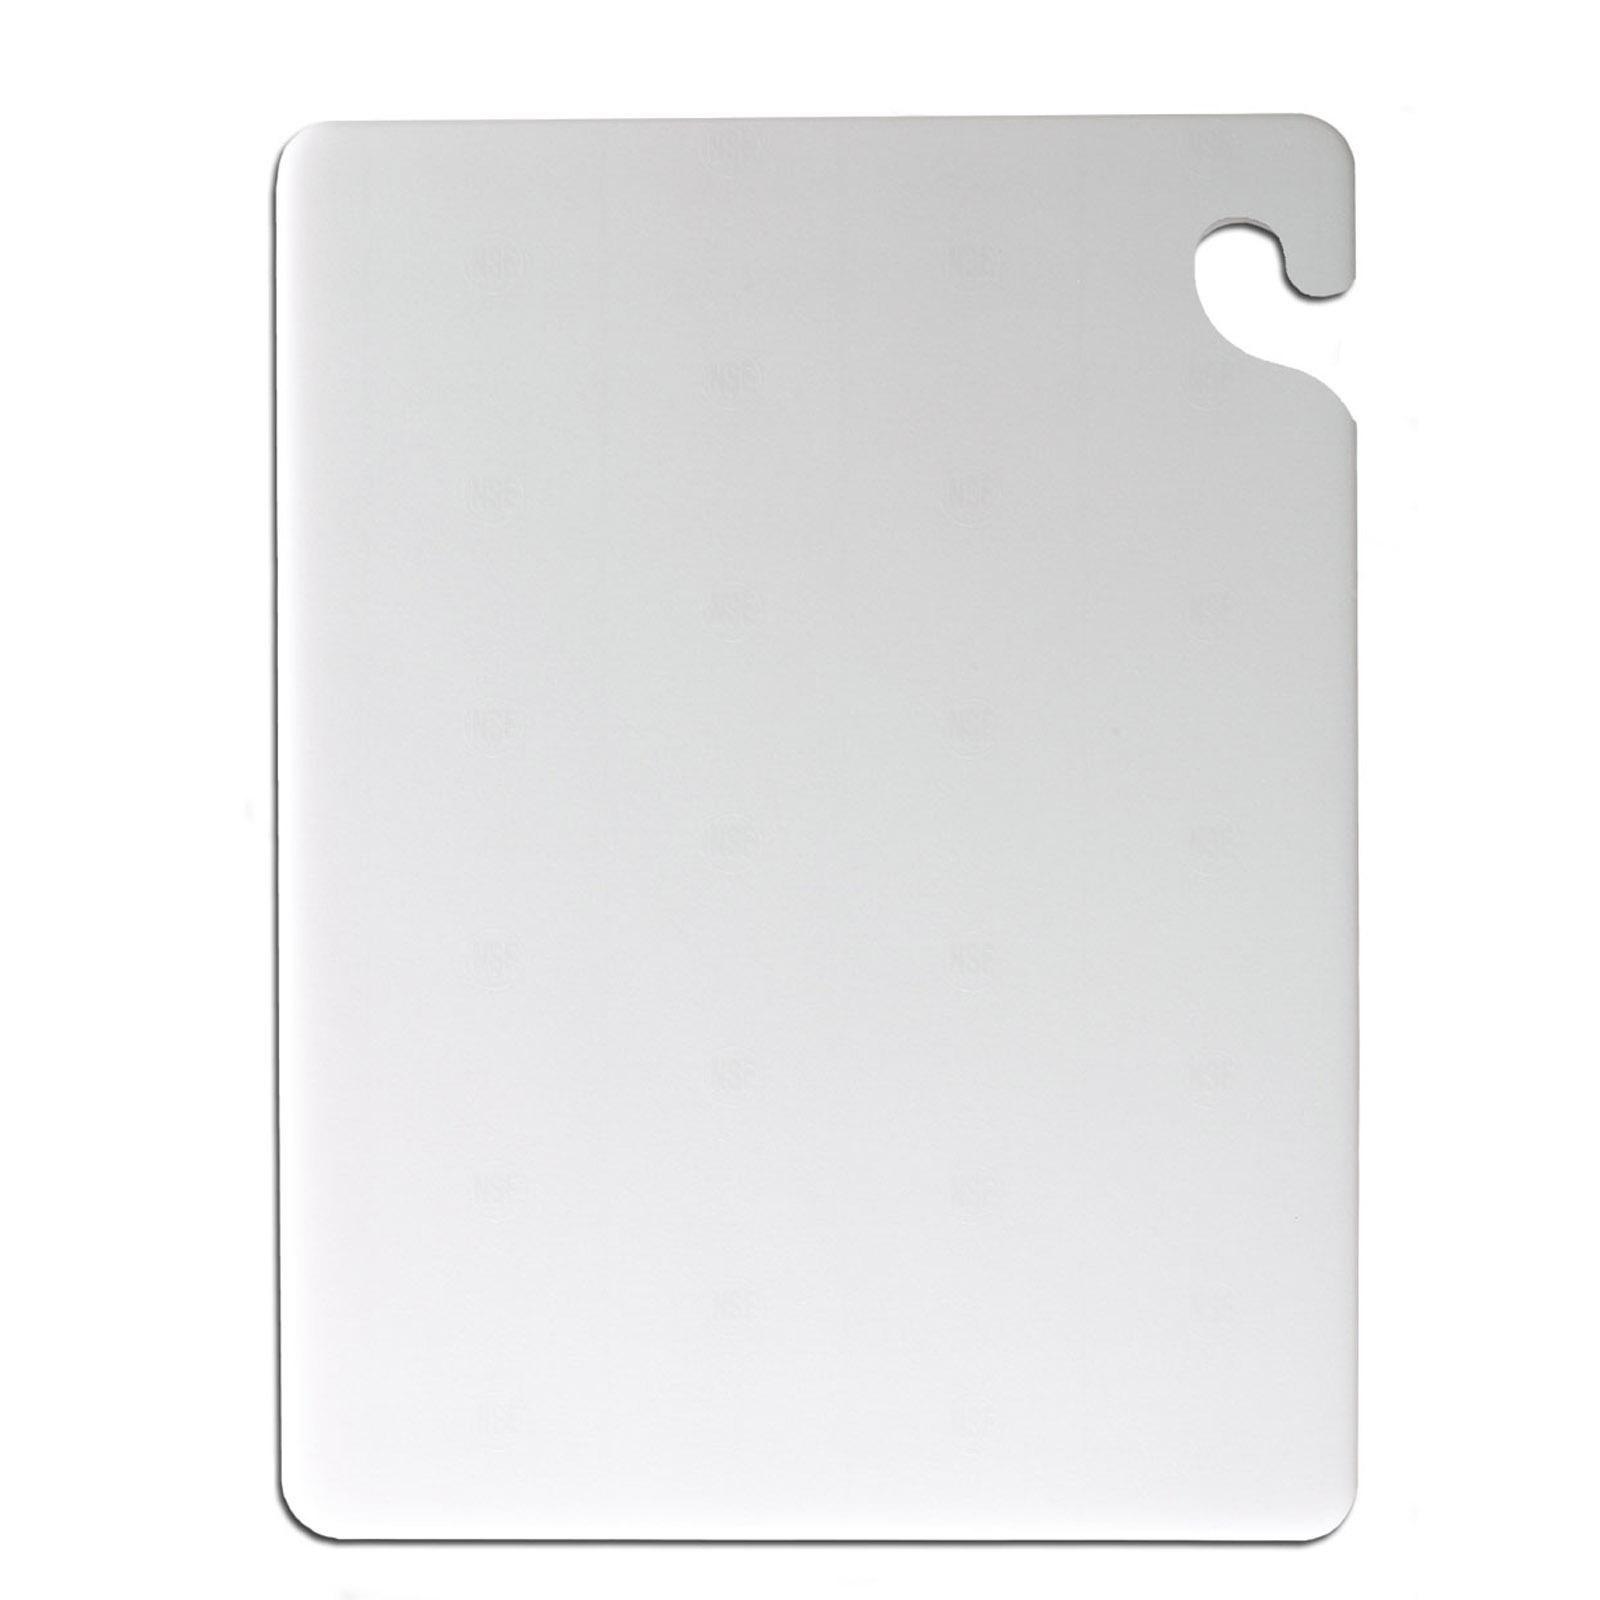 San Jamar CB242434WH cutting board, plastic